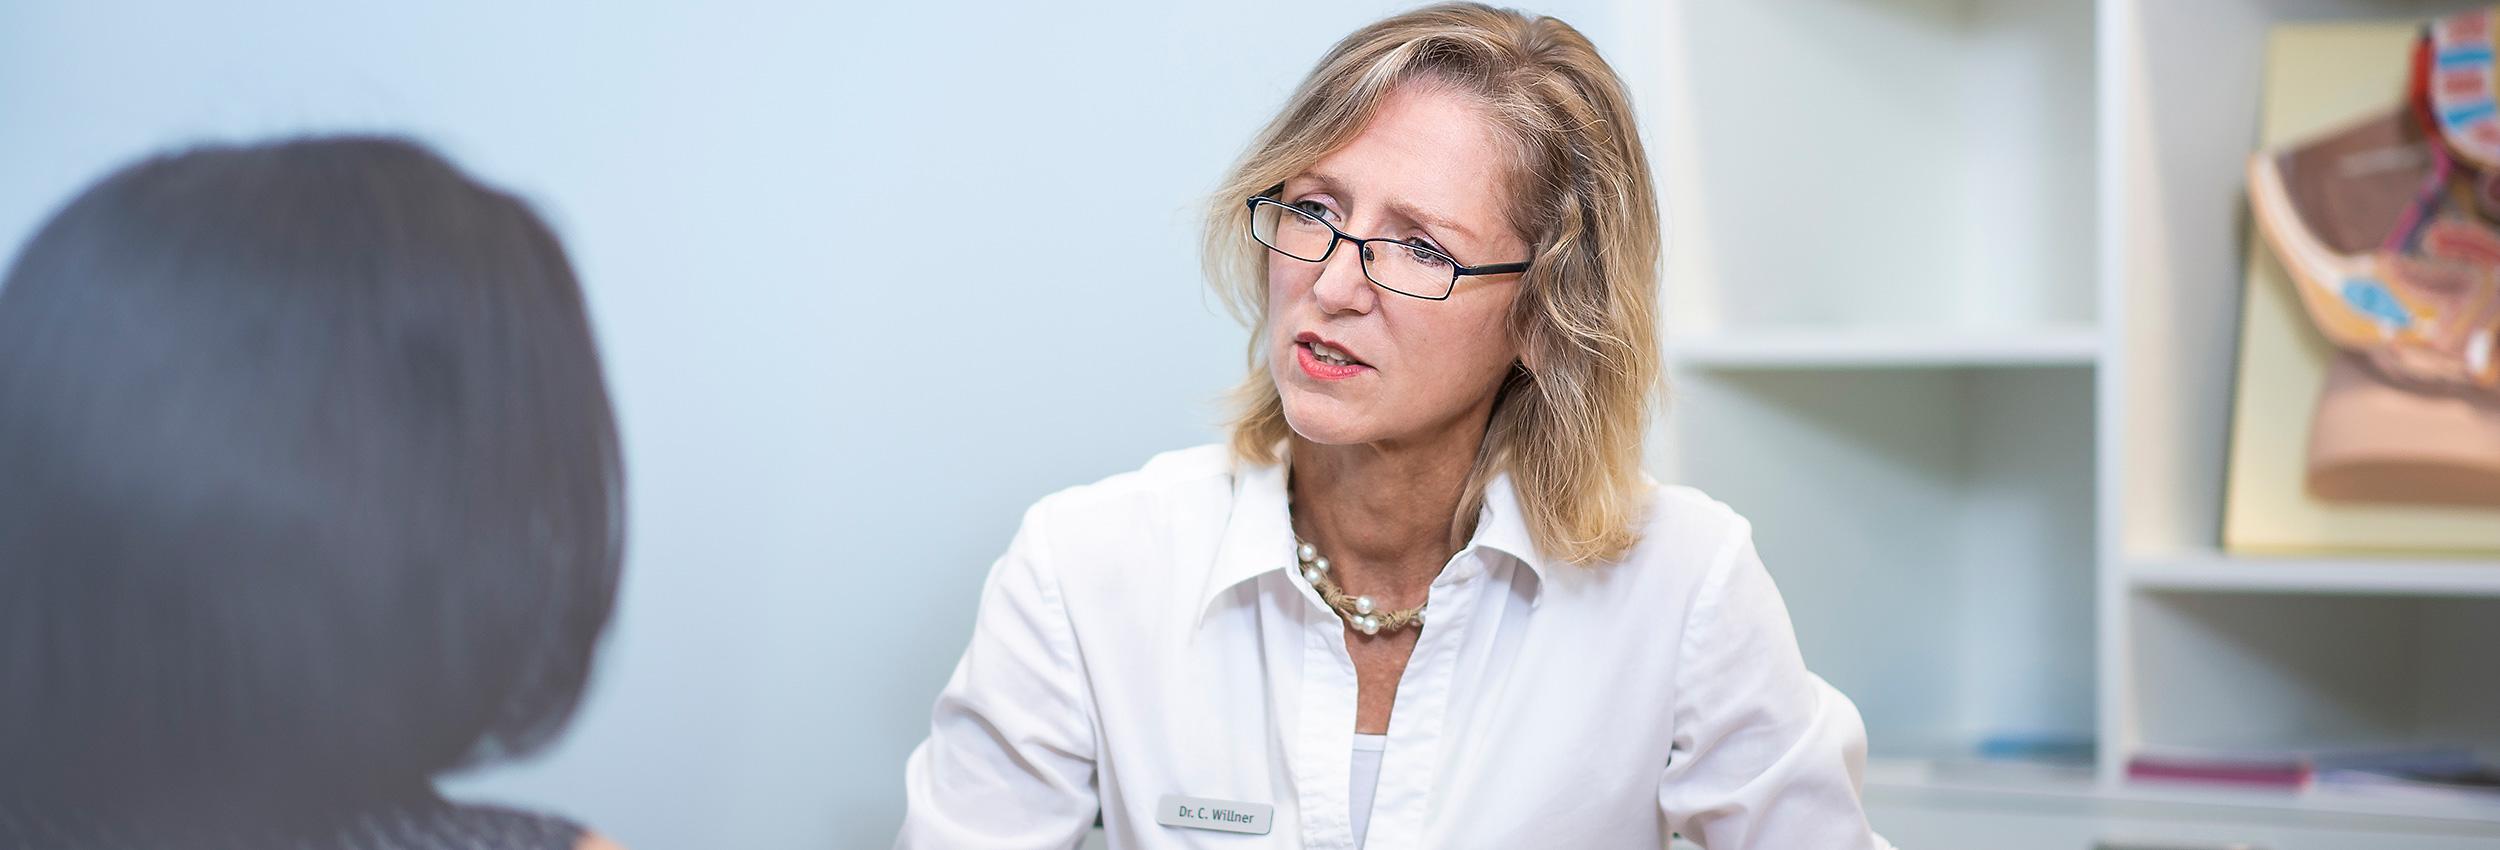 Facharzt Gynäkologie Geburtshilfe FMH